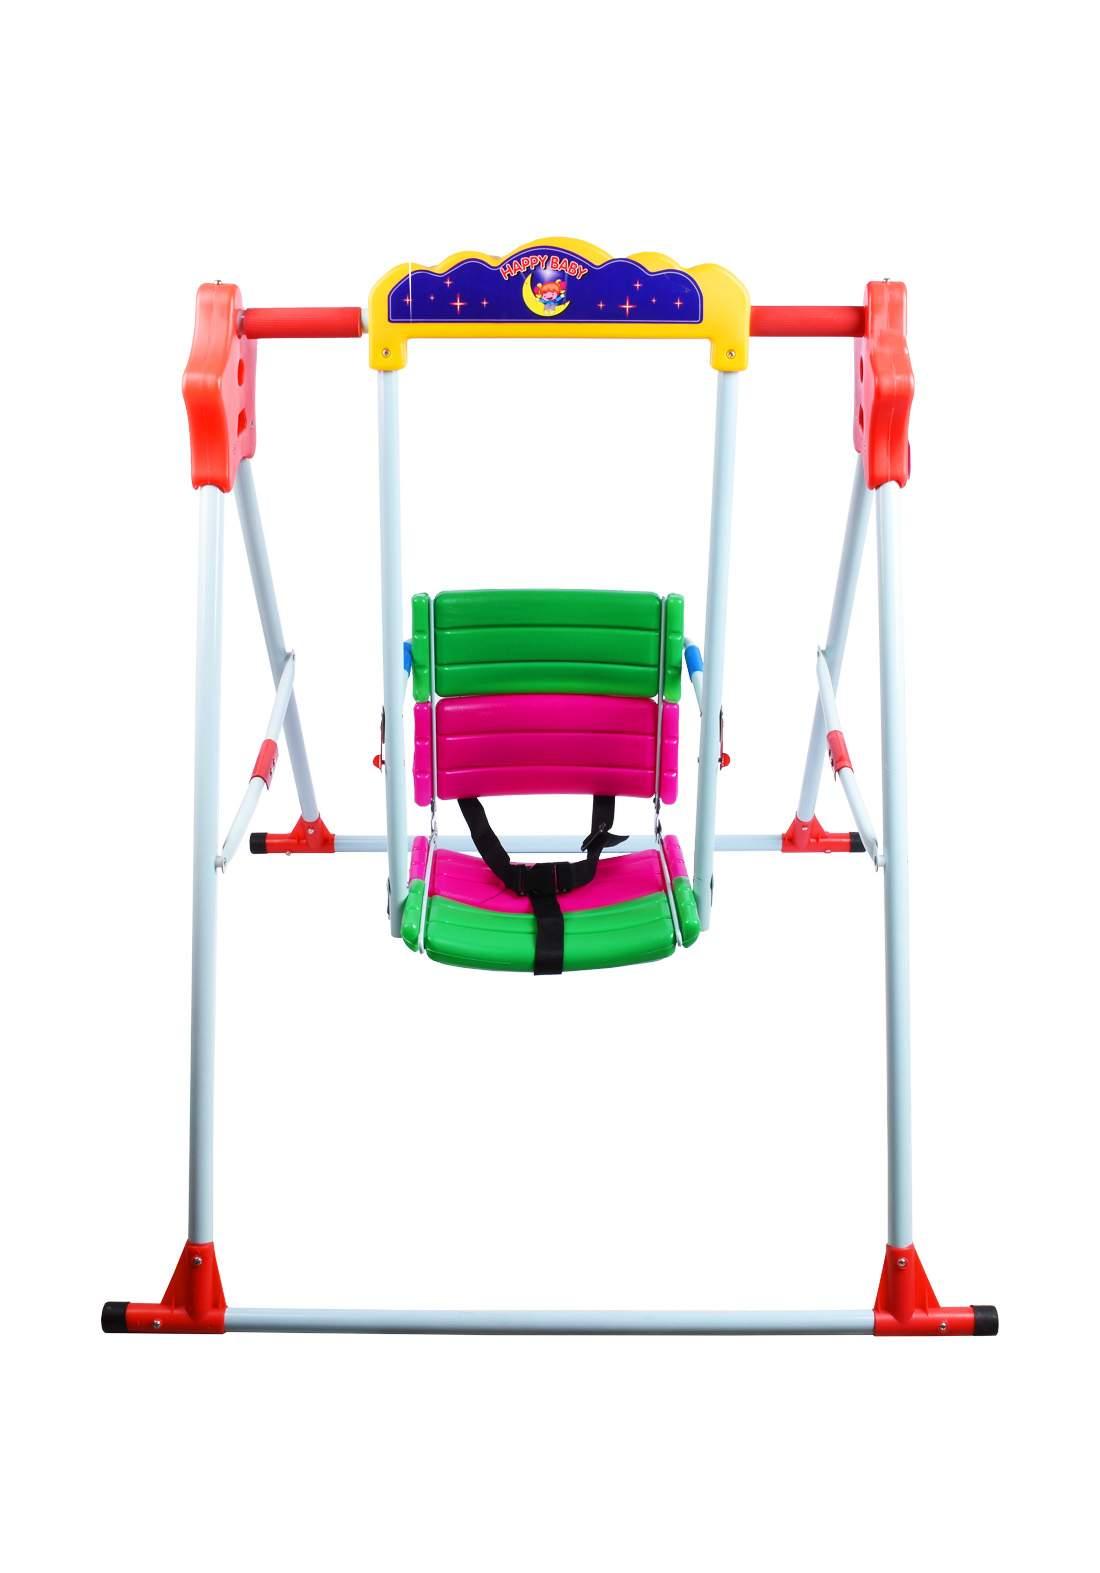 Baby Swing ارجوحة للاطفال